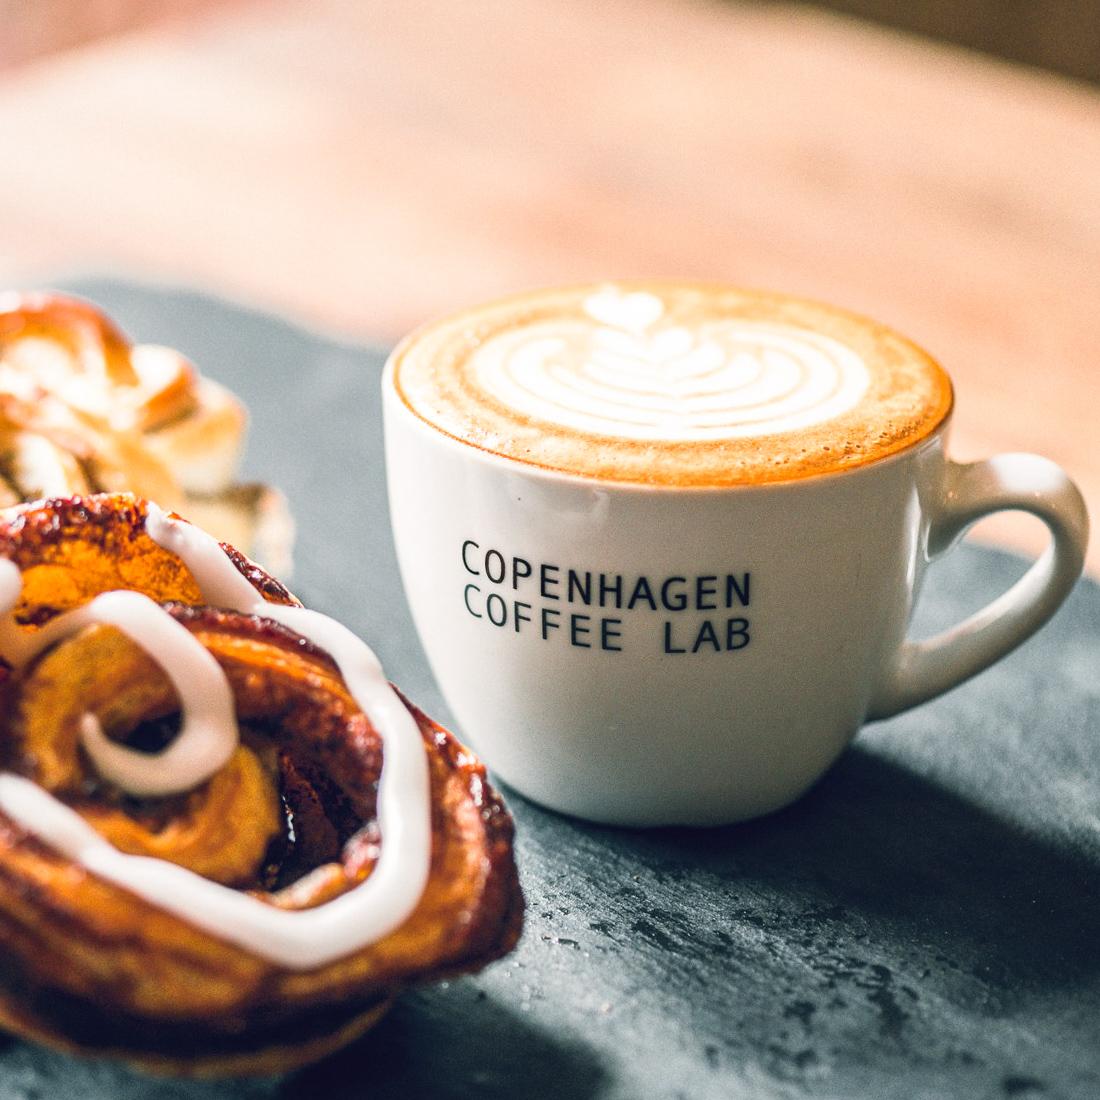 Copenhagen Coffee Lab in Hamburg-Eppendorf